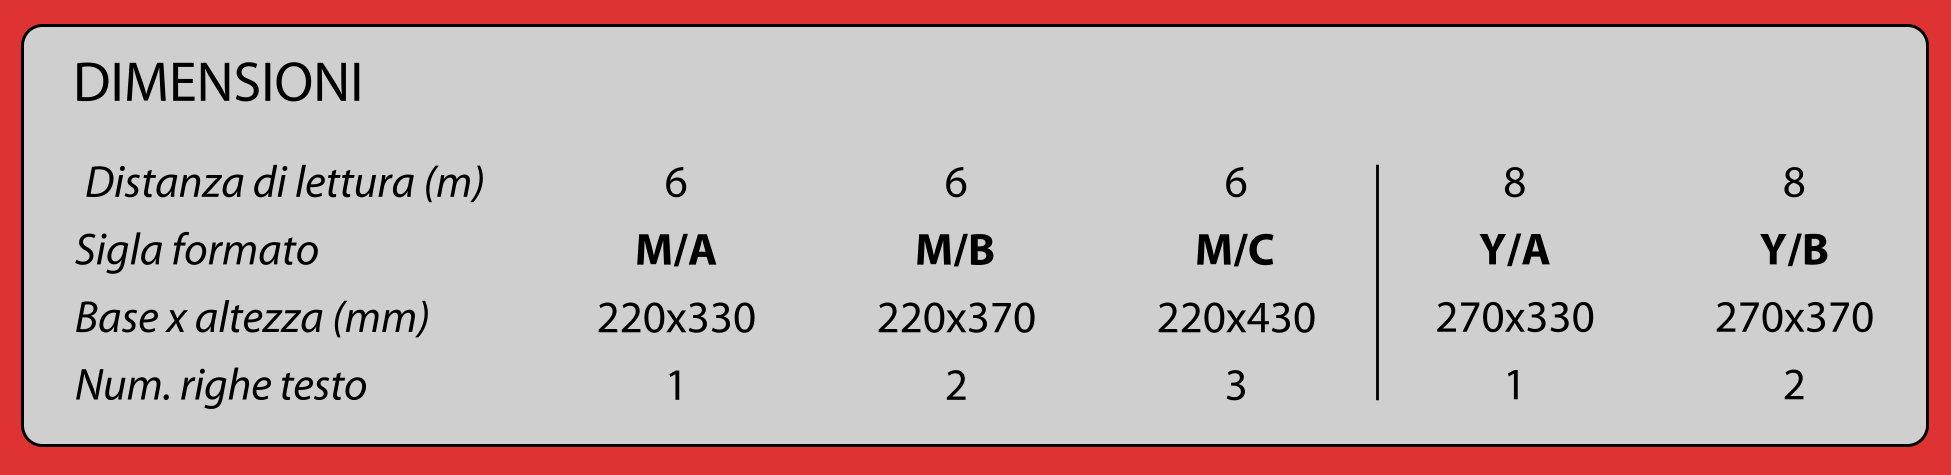 dimensioni cartelli divieto serie 251